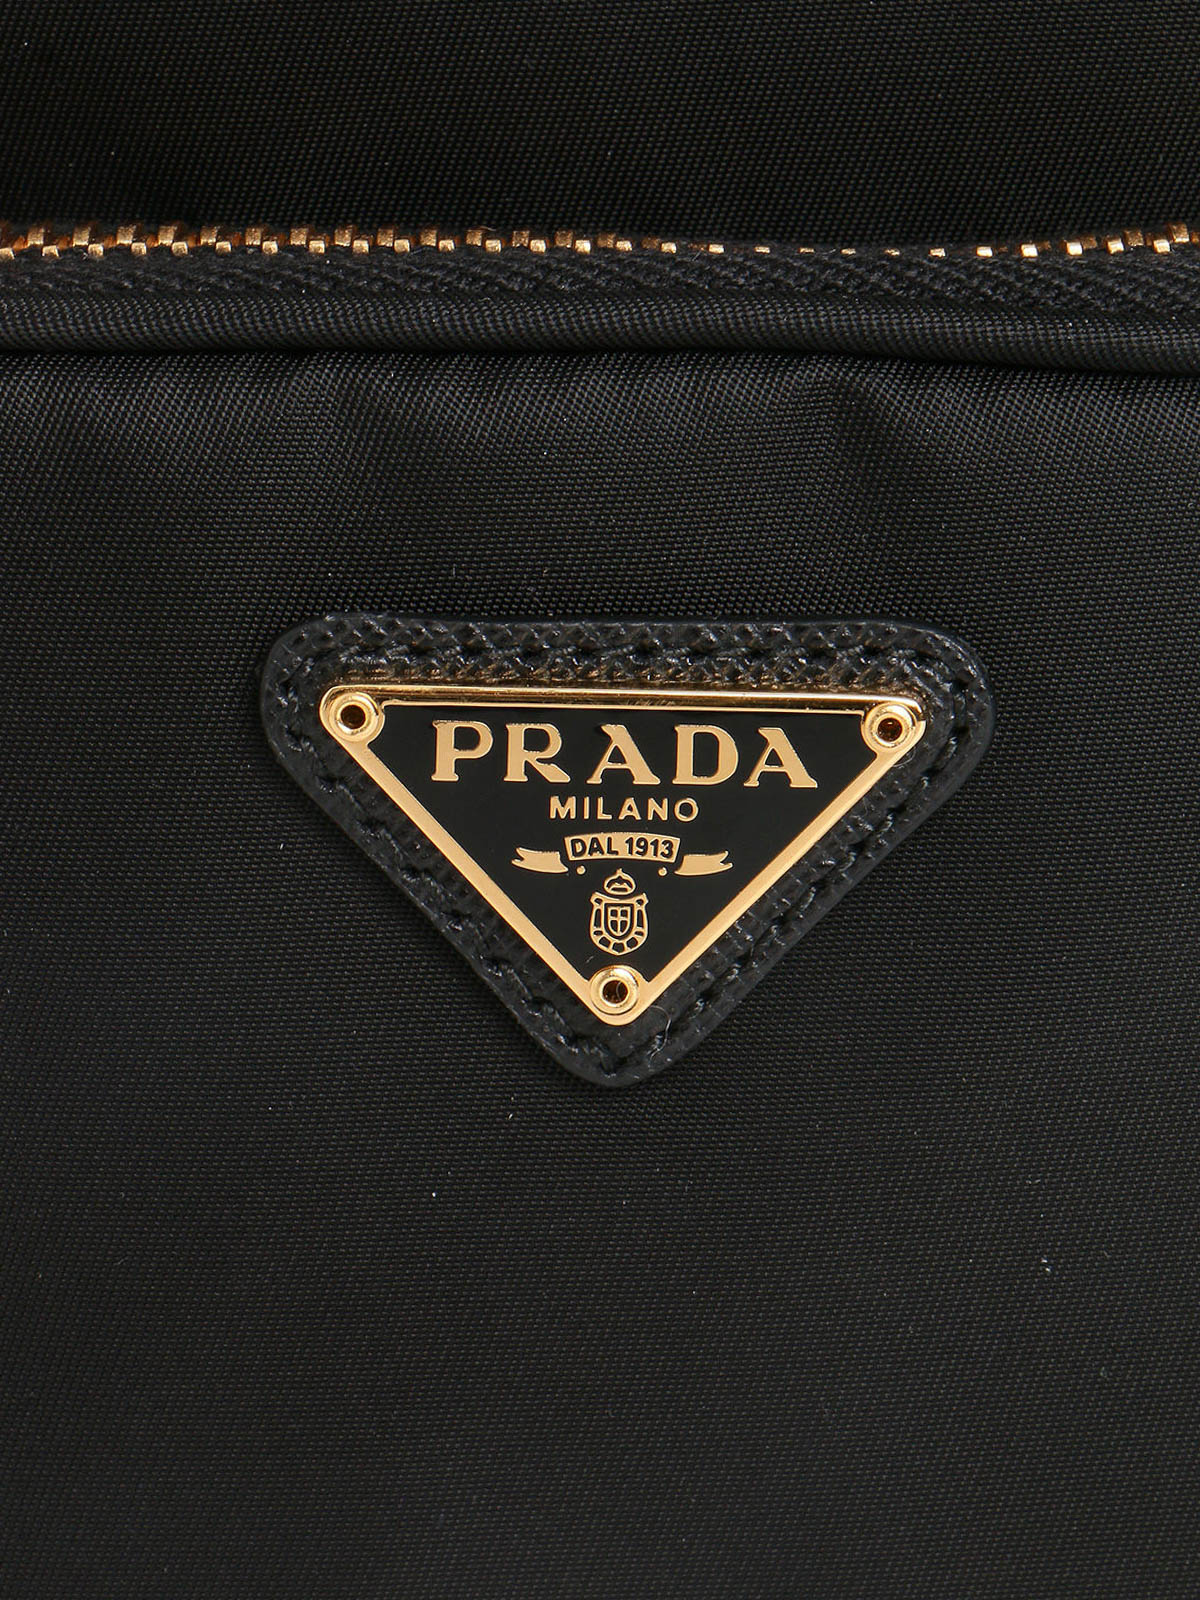 prada bags shop online prada cheap online. Black Bedroom Furniture Sets. Home Design Ideas